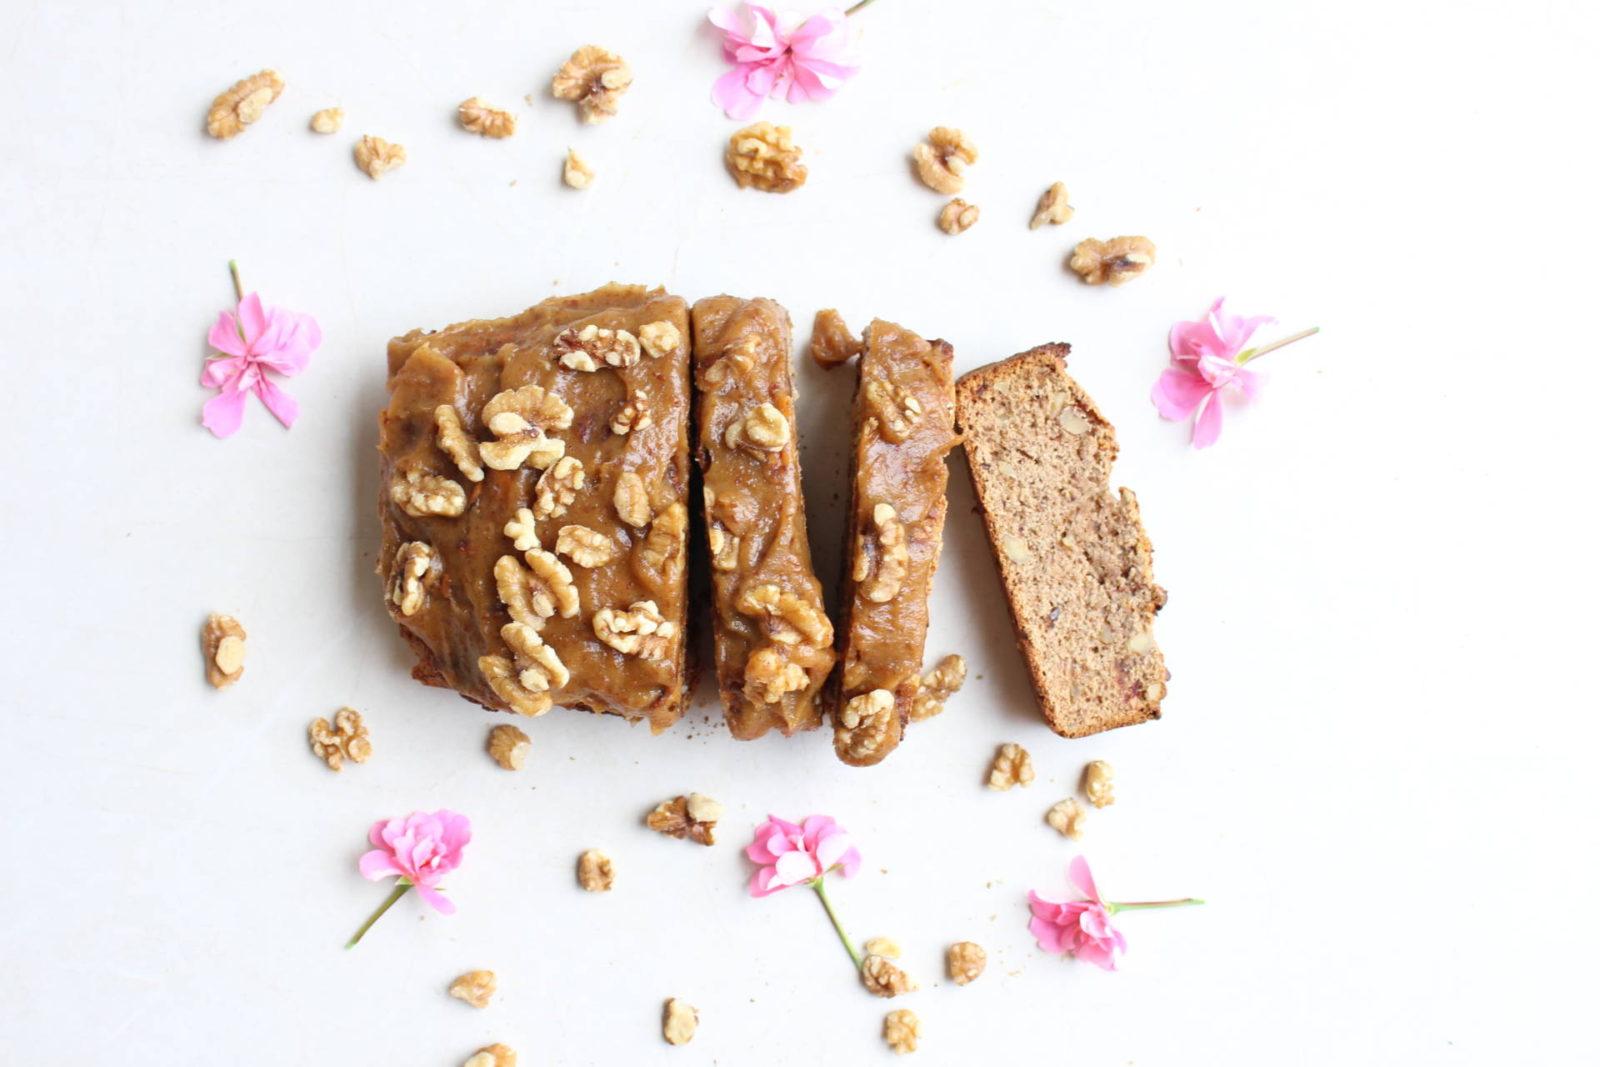 Salted-Caramel-Walnut-Loaf-1600x1067.jpeg